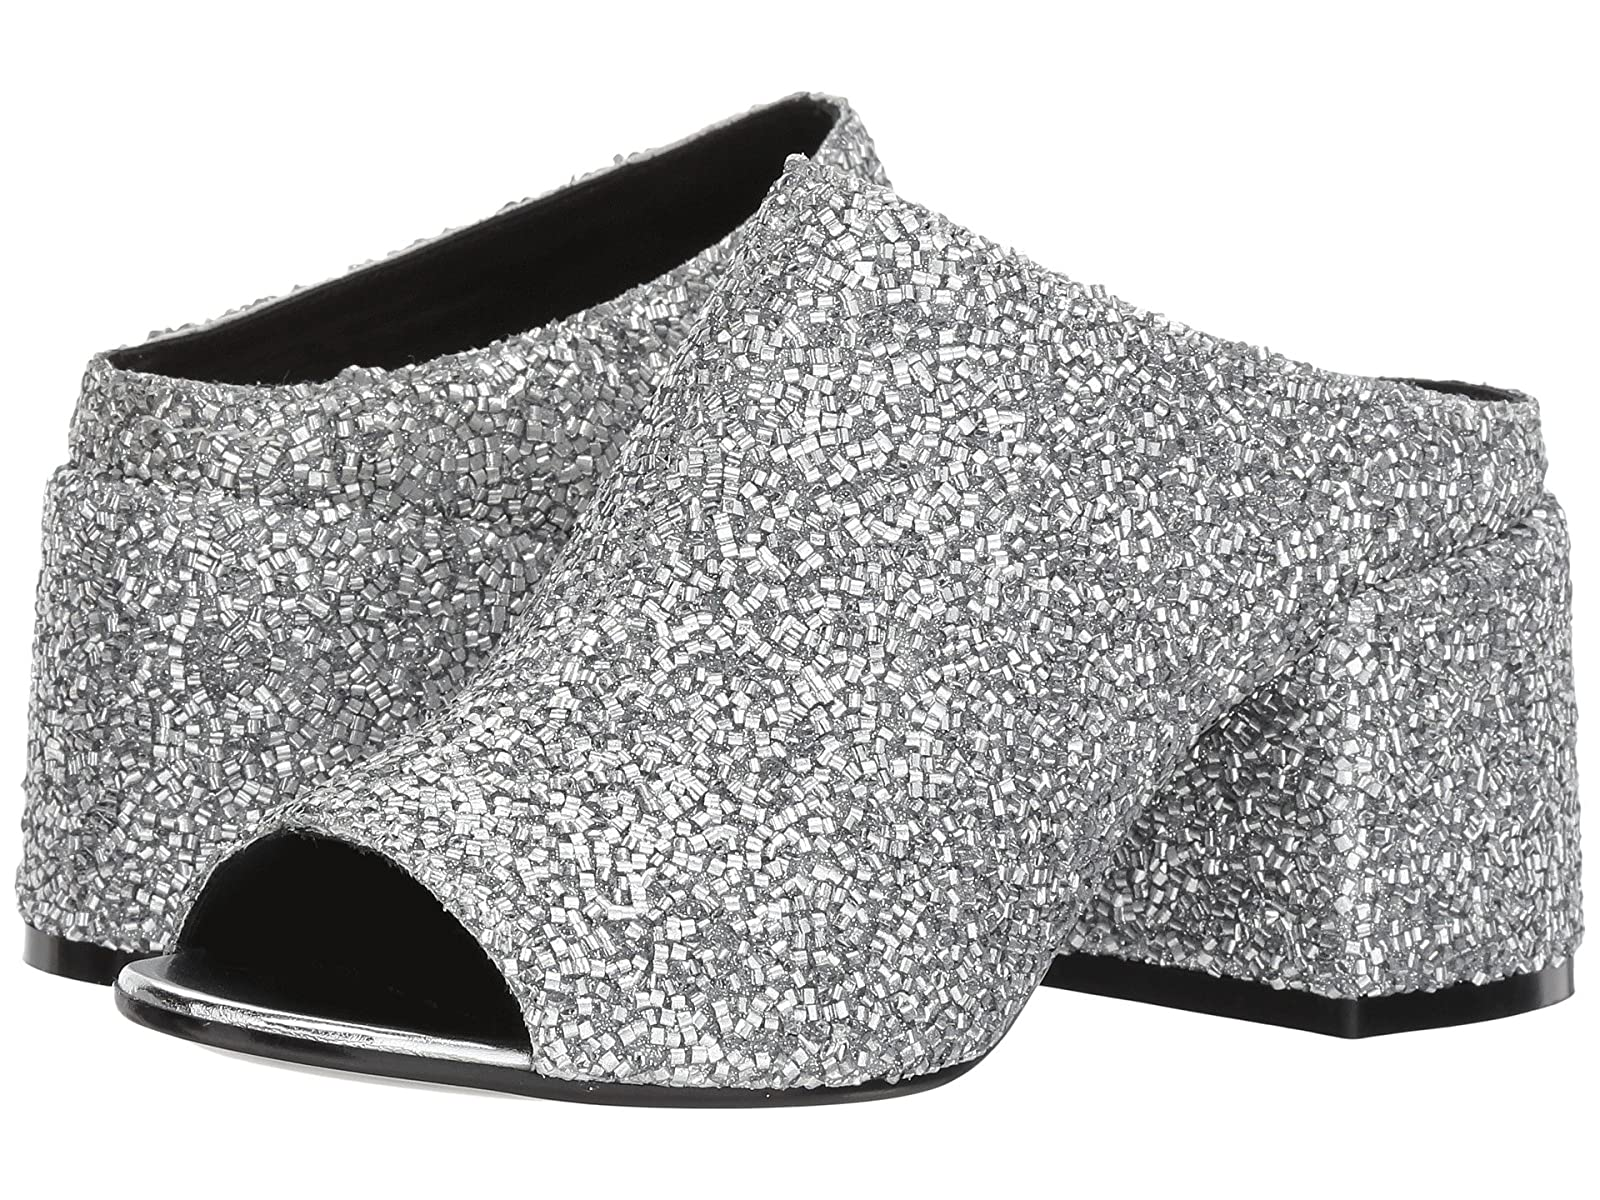 MM6 Maison Margiela Chunky Heel SlideCheap and distinctive eye-catching shoes